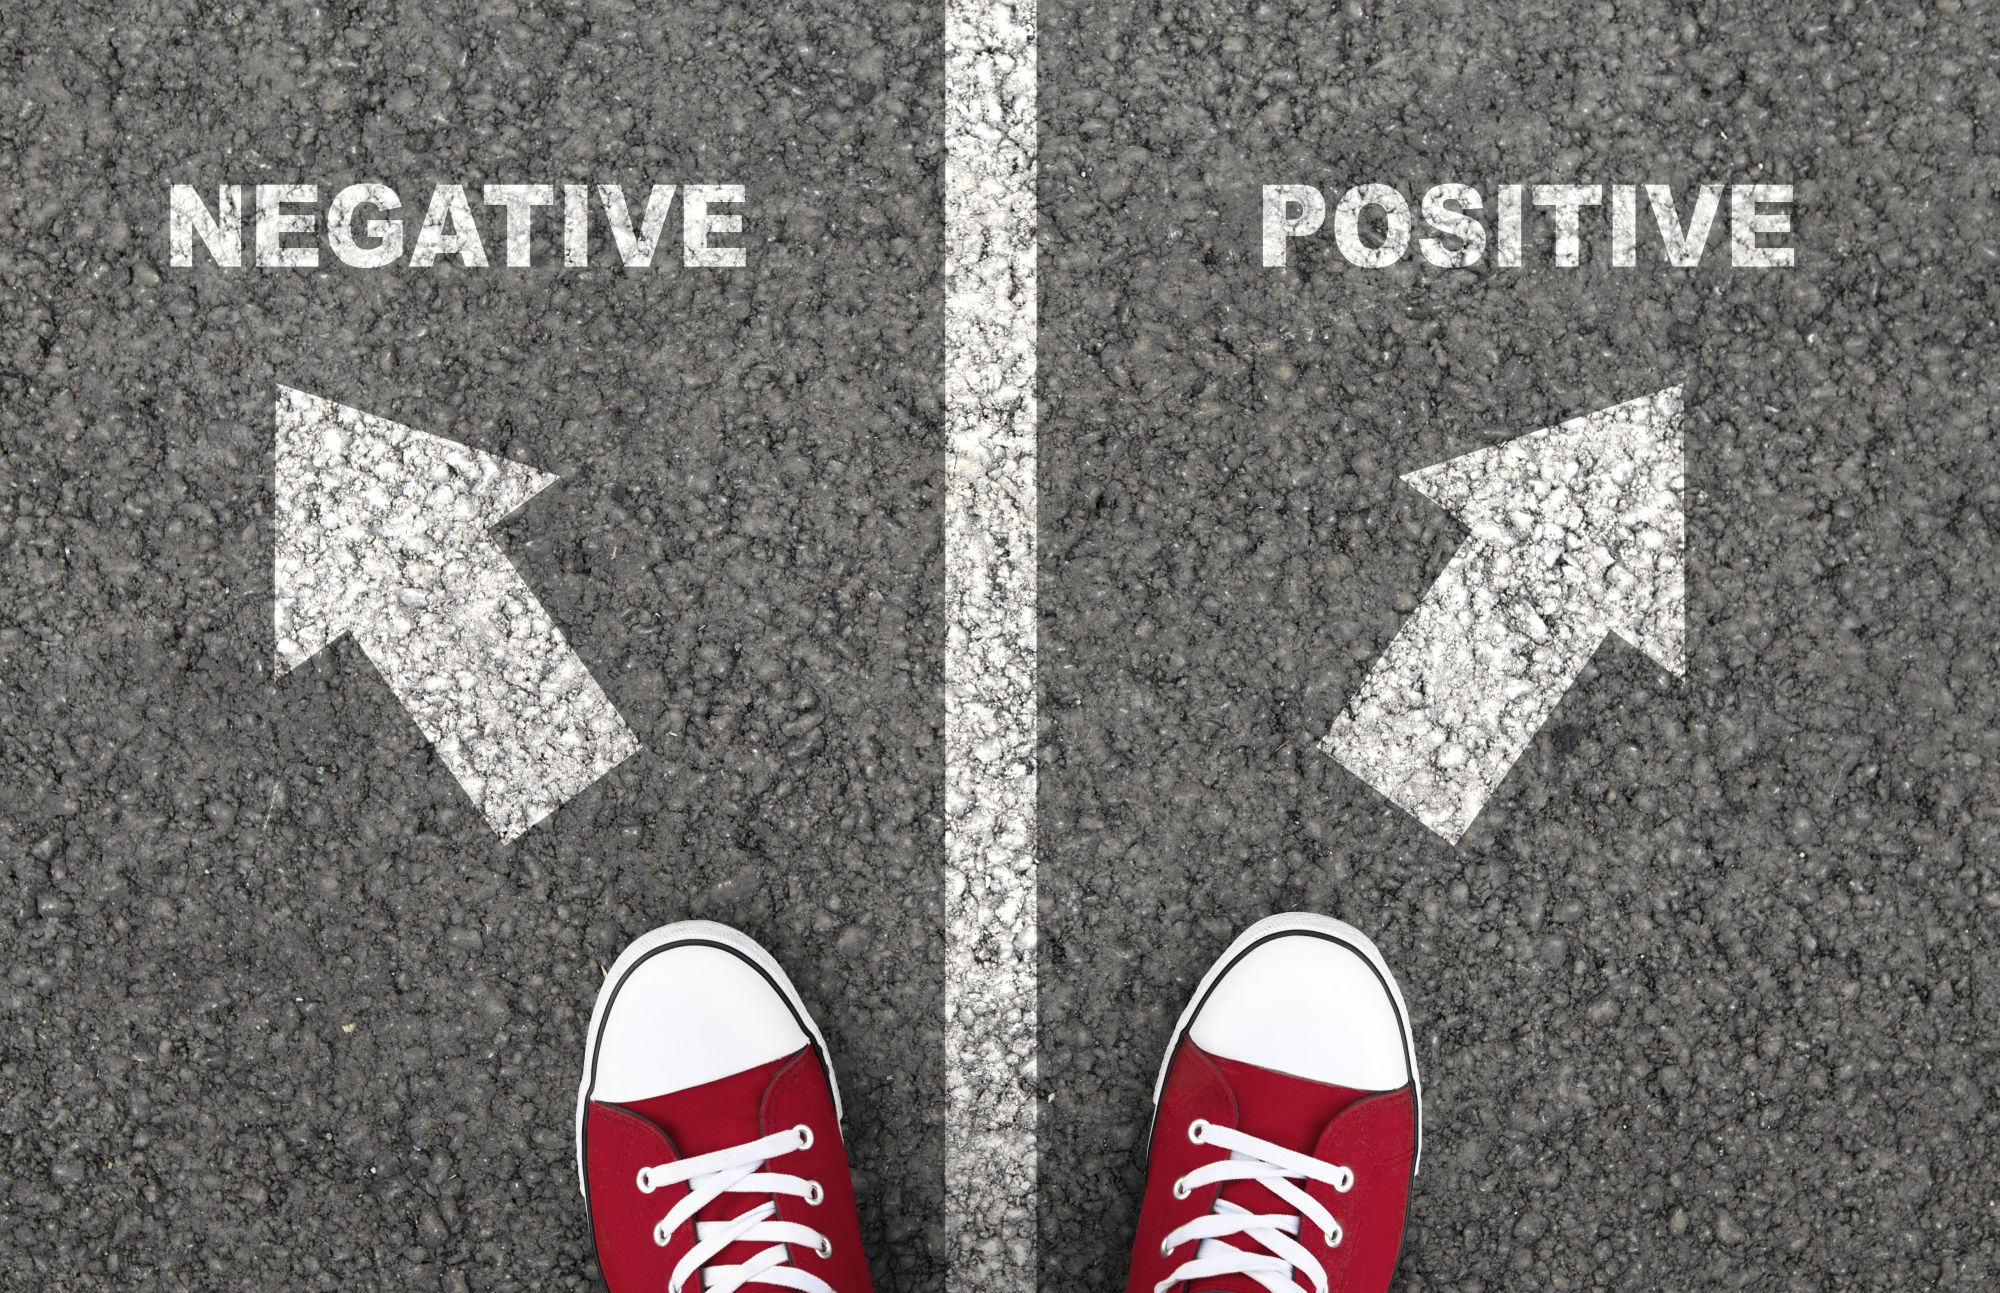 camino positivo negativo